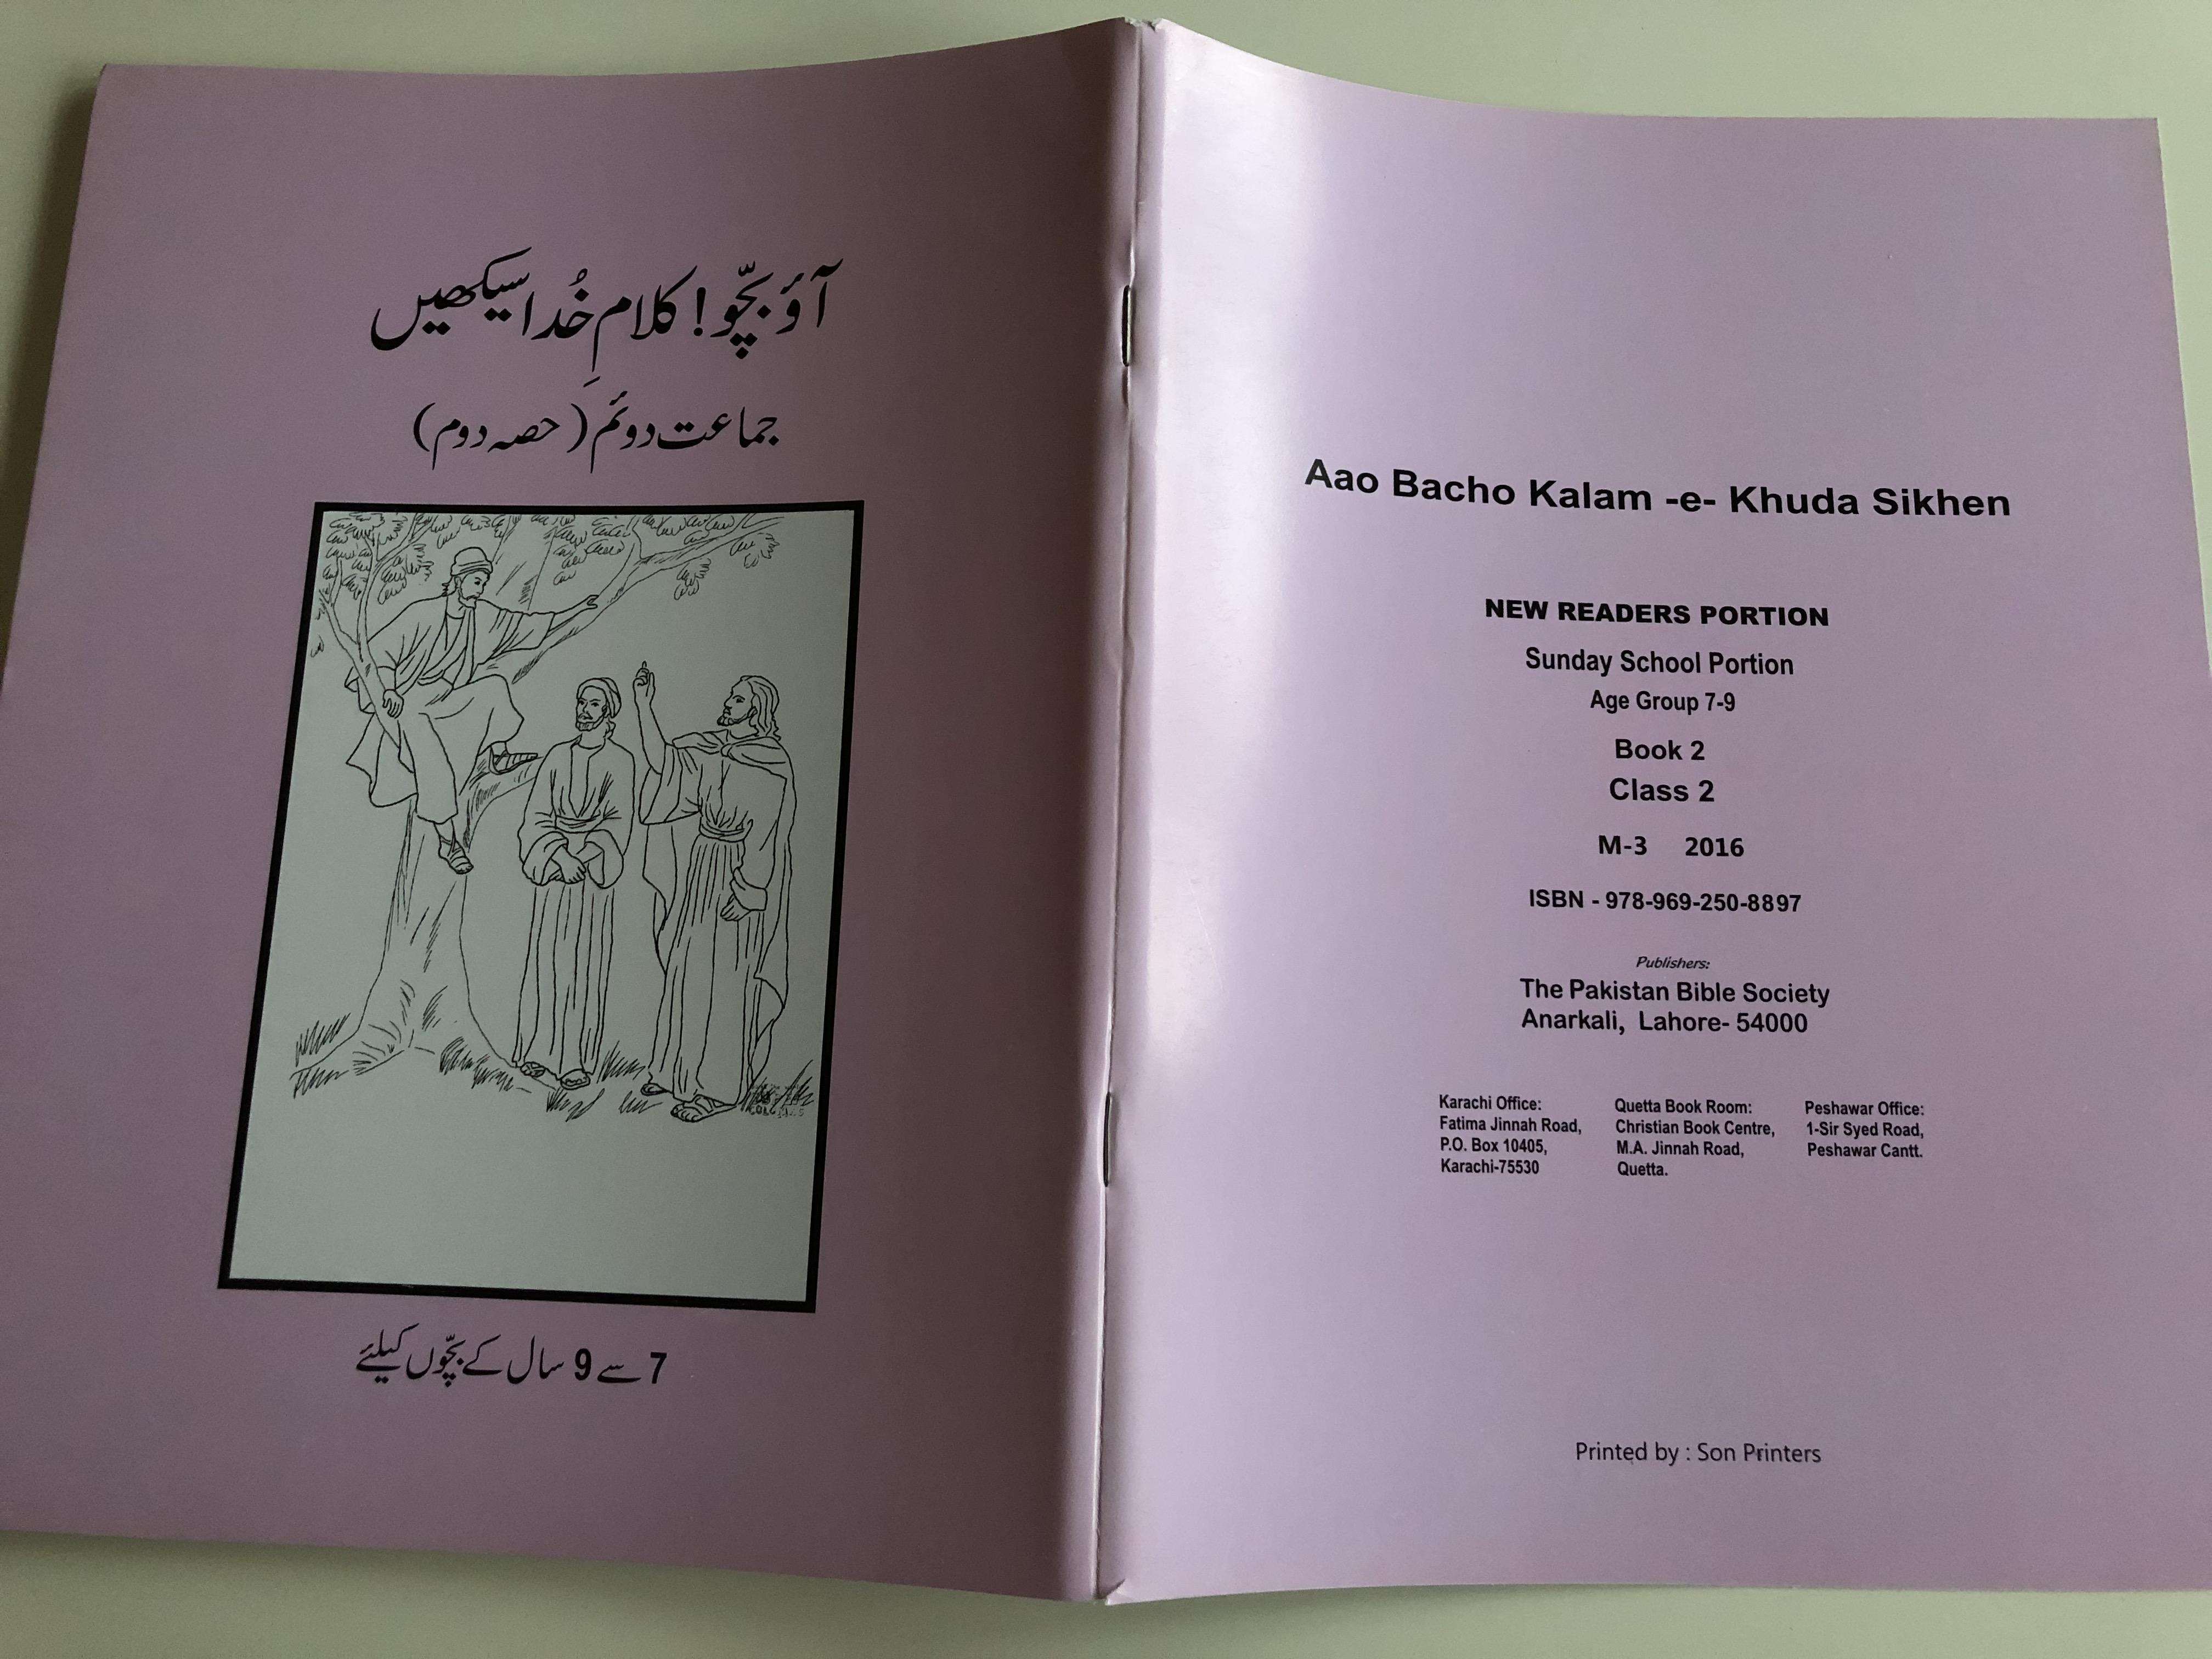 urdu-sunday-school-reading-book-2-class-2-new-readers-portion-13.jpg